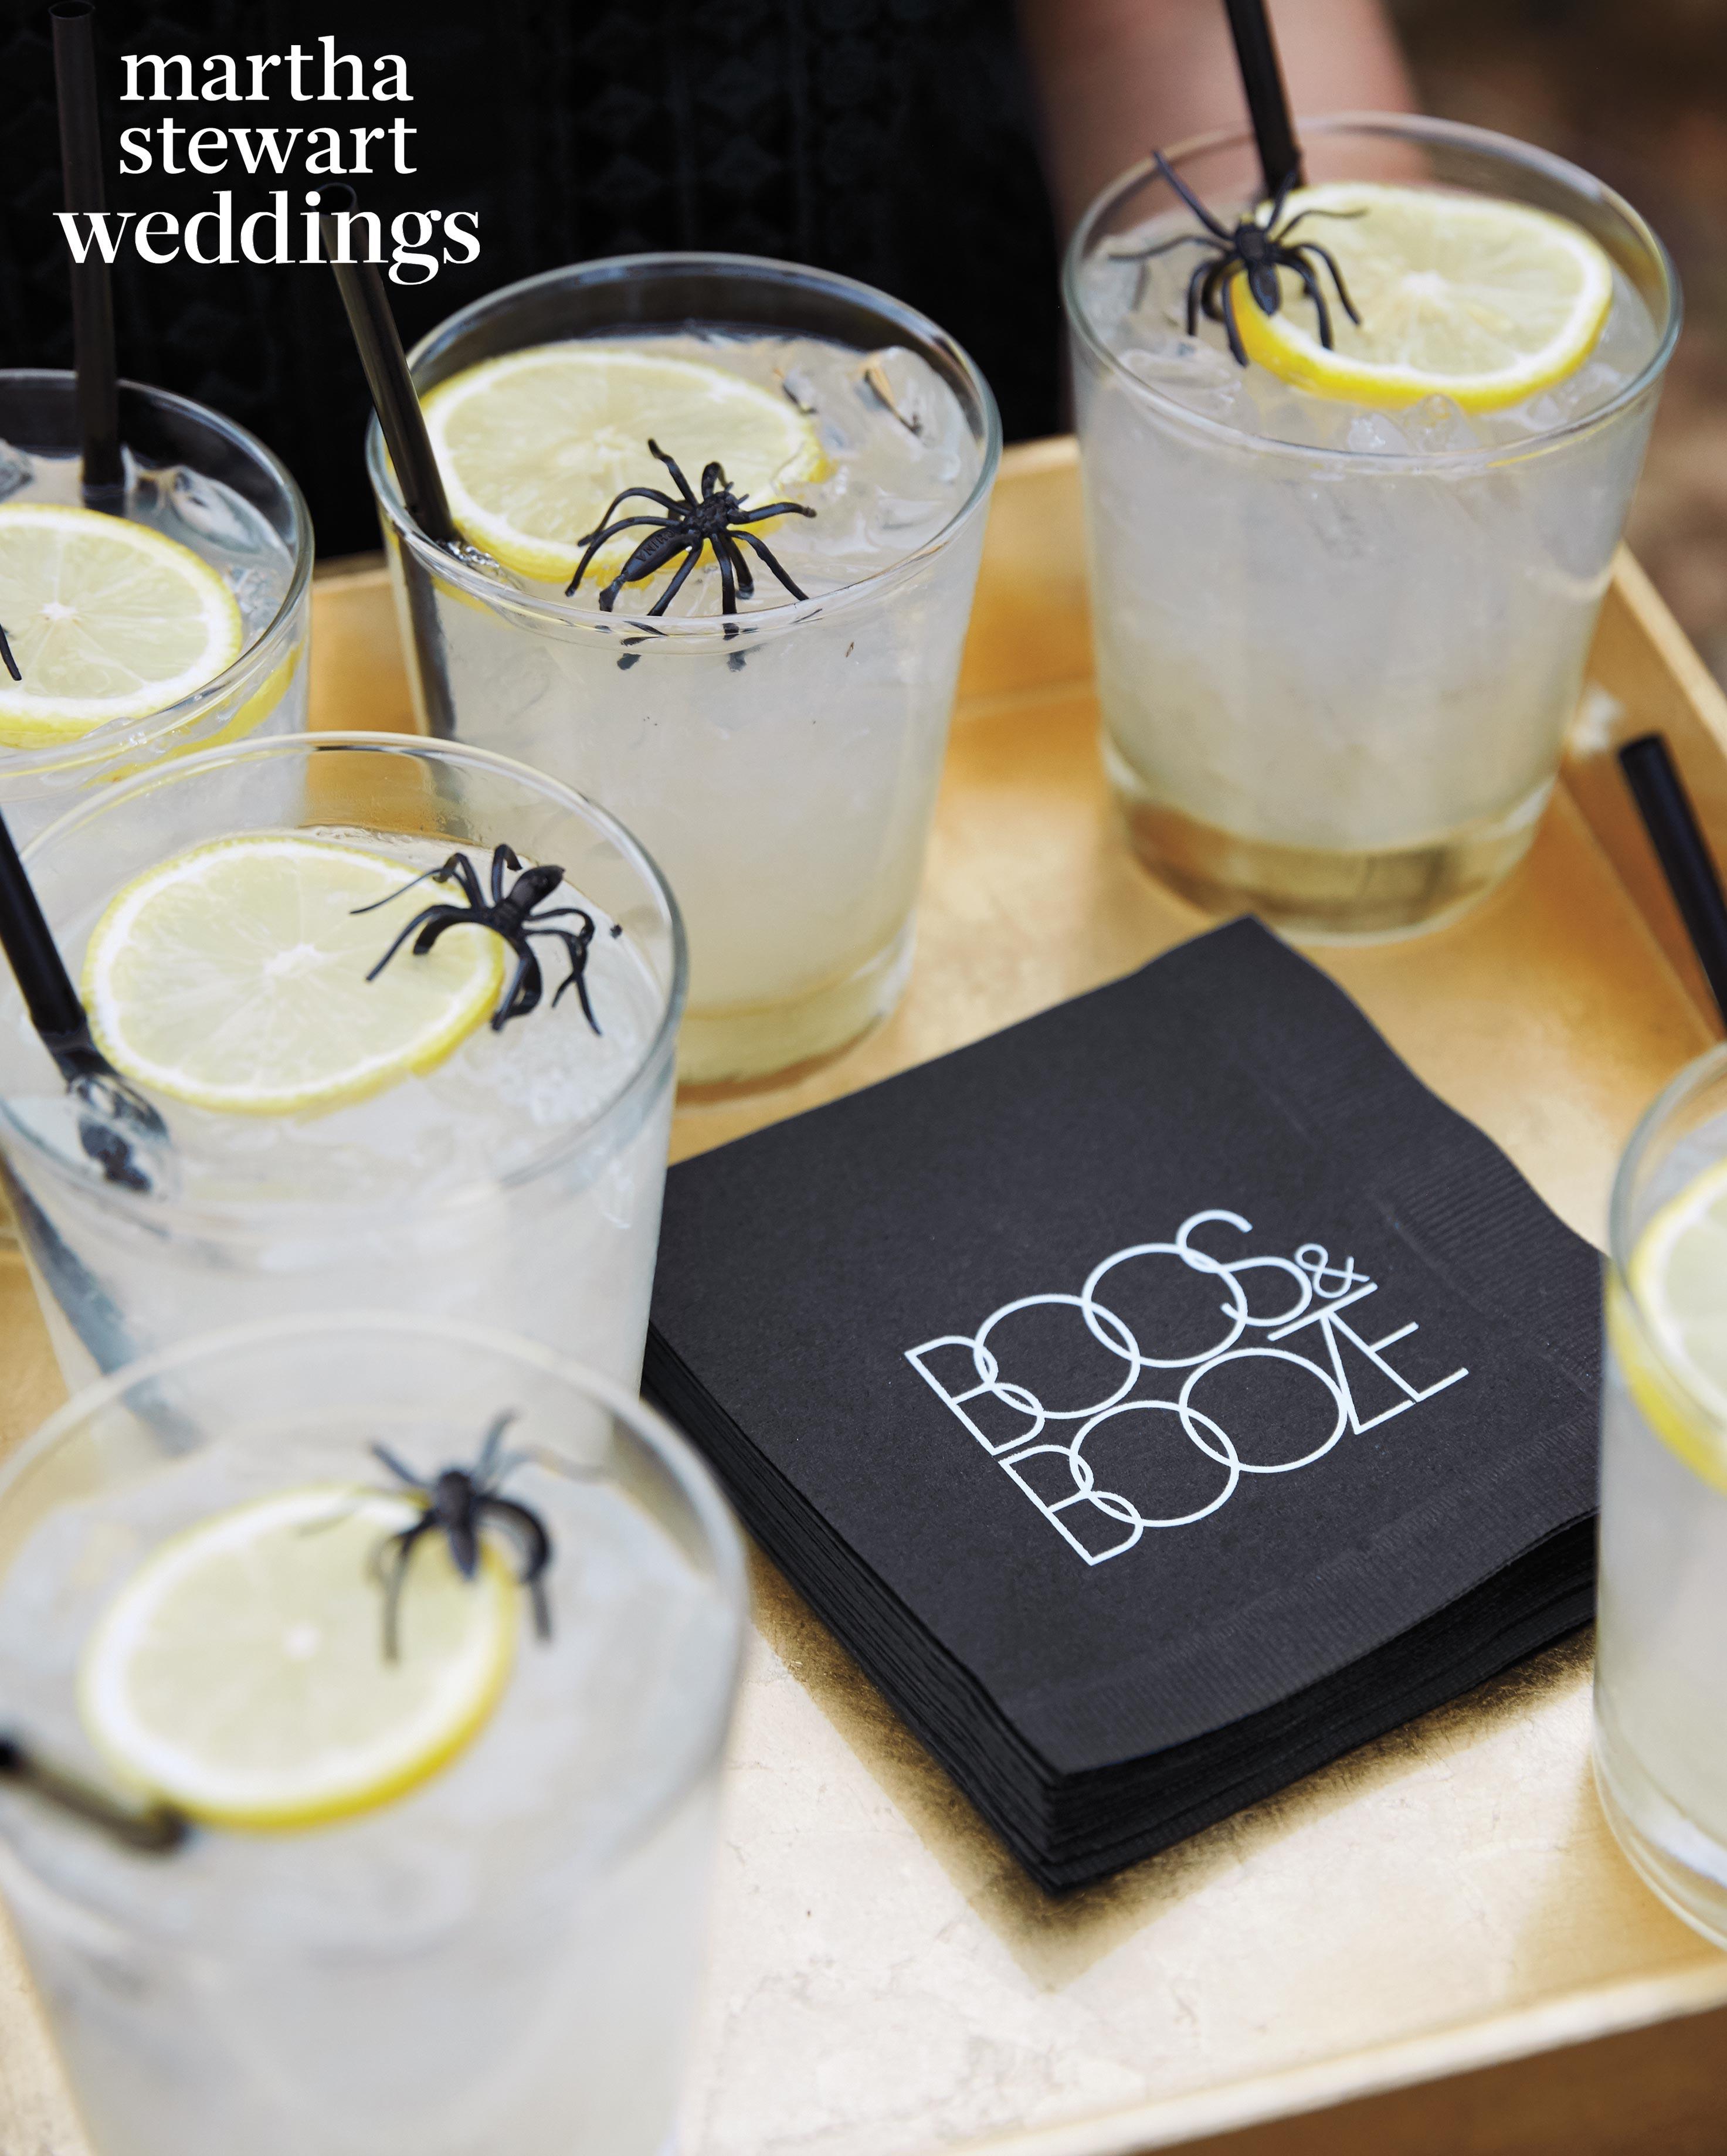 jamie-bryan-wedding-10-drinks-0489-d112664.jpg